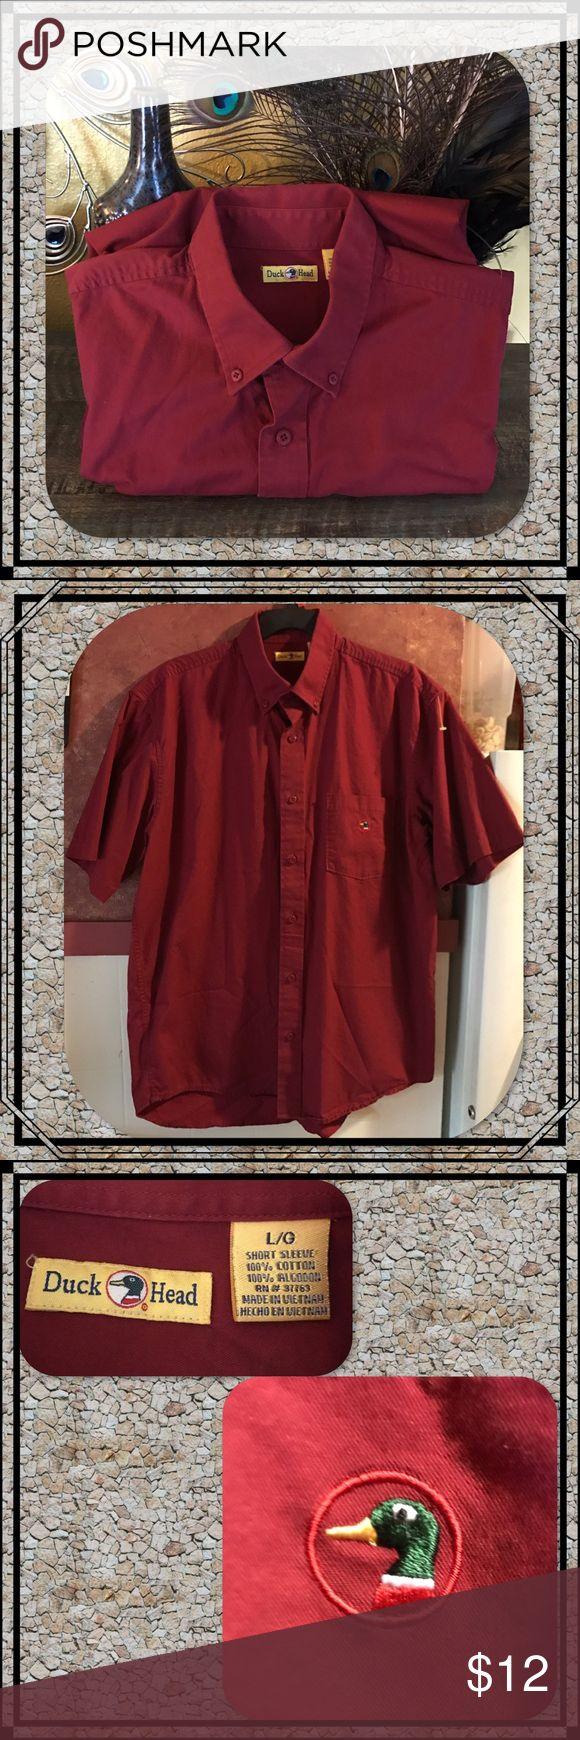 Duck Head Men's Short Sleeve Dress Shirt 100% Cotton Duck Head Men's Short Sleeve button collar shirt. EUC! Looks brand new! Size Large Duck Head Shirts Dress Shirts